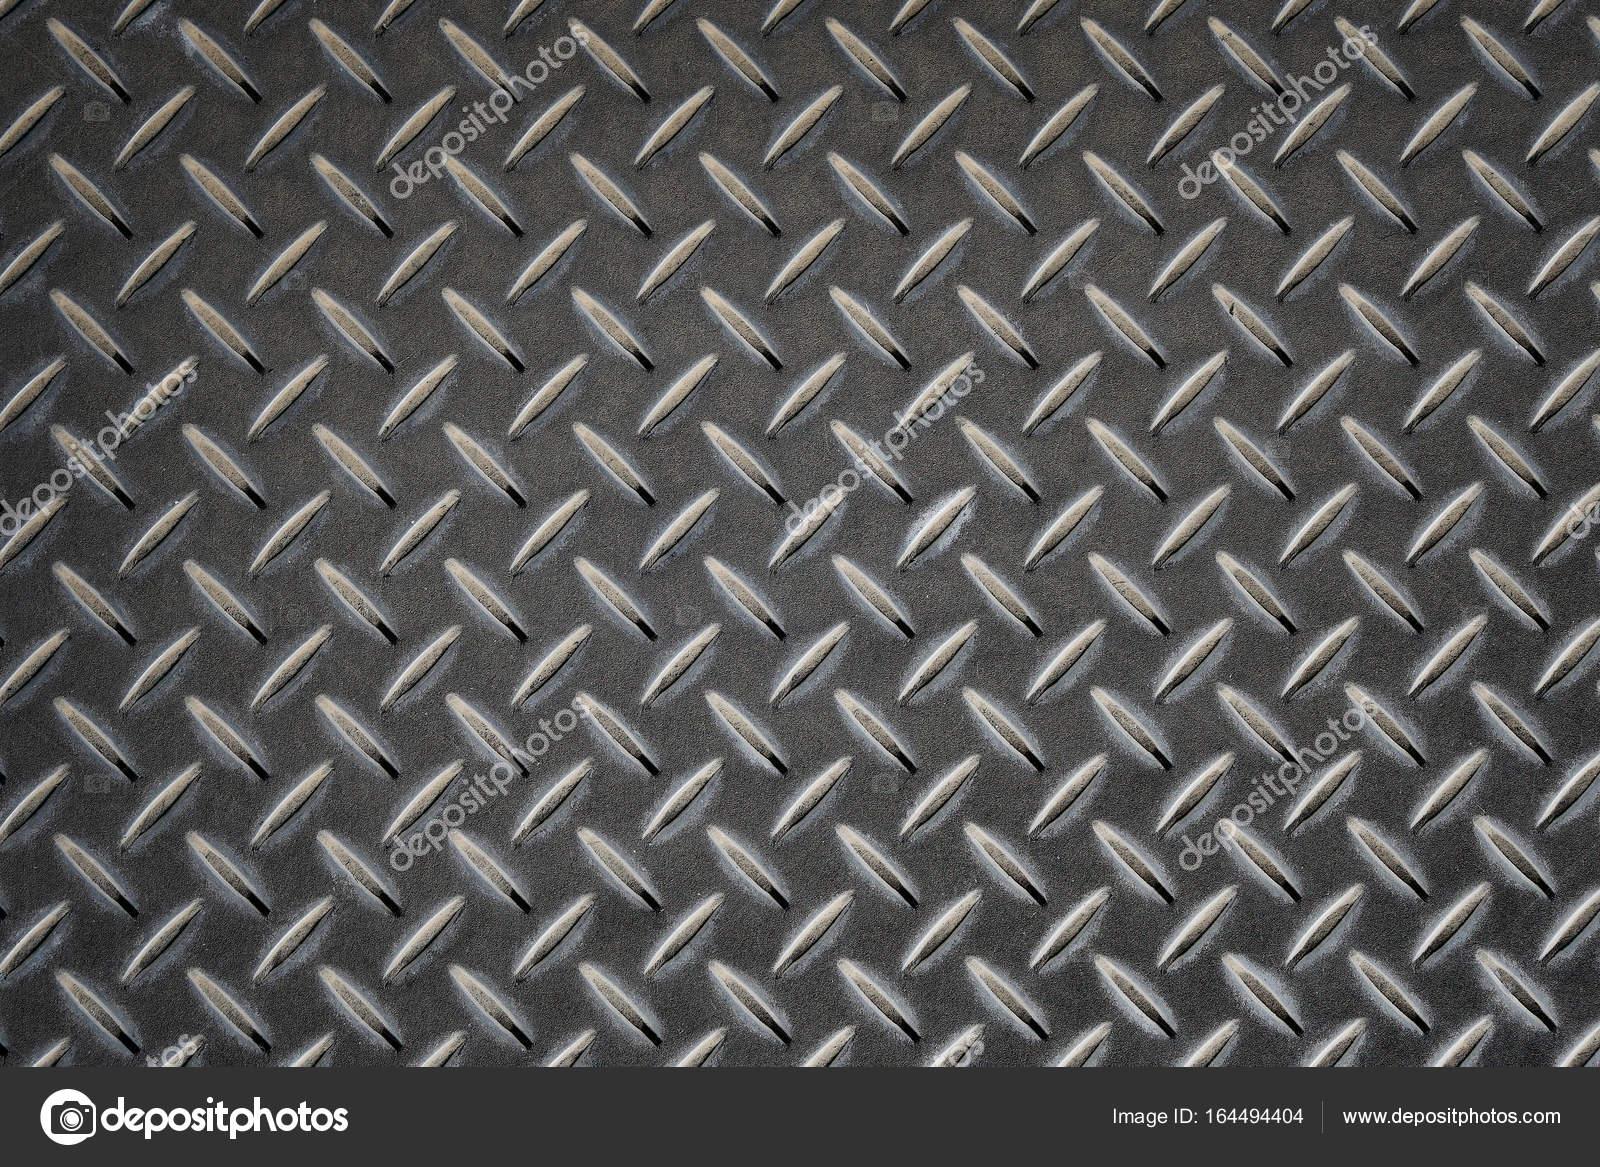 Deslizamiento chapa gris con rombos fotos de stock for Chapa antideslizante